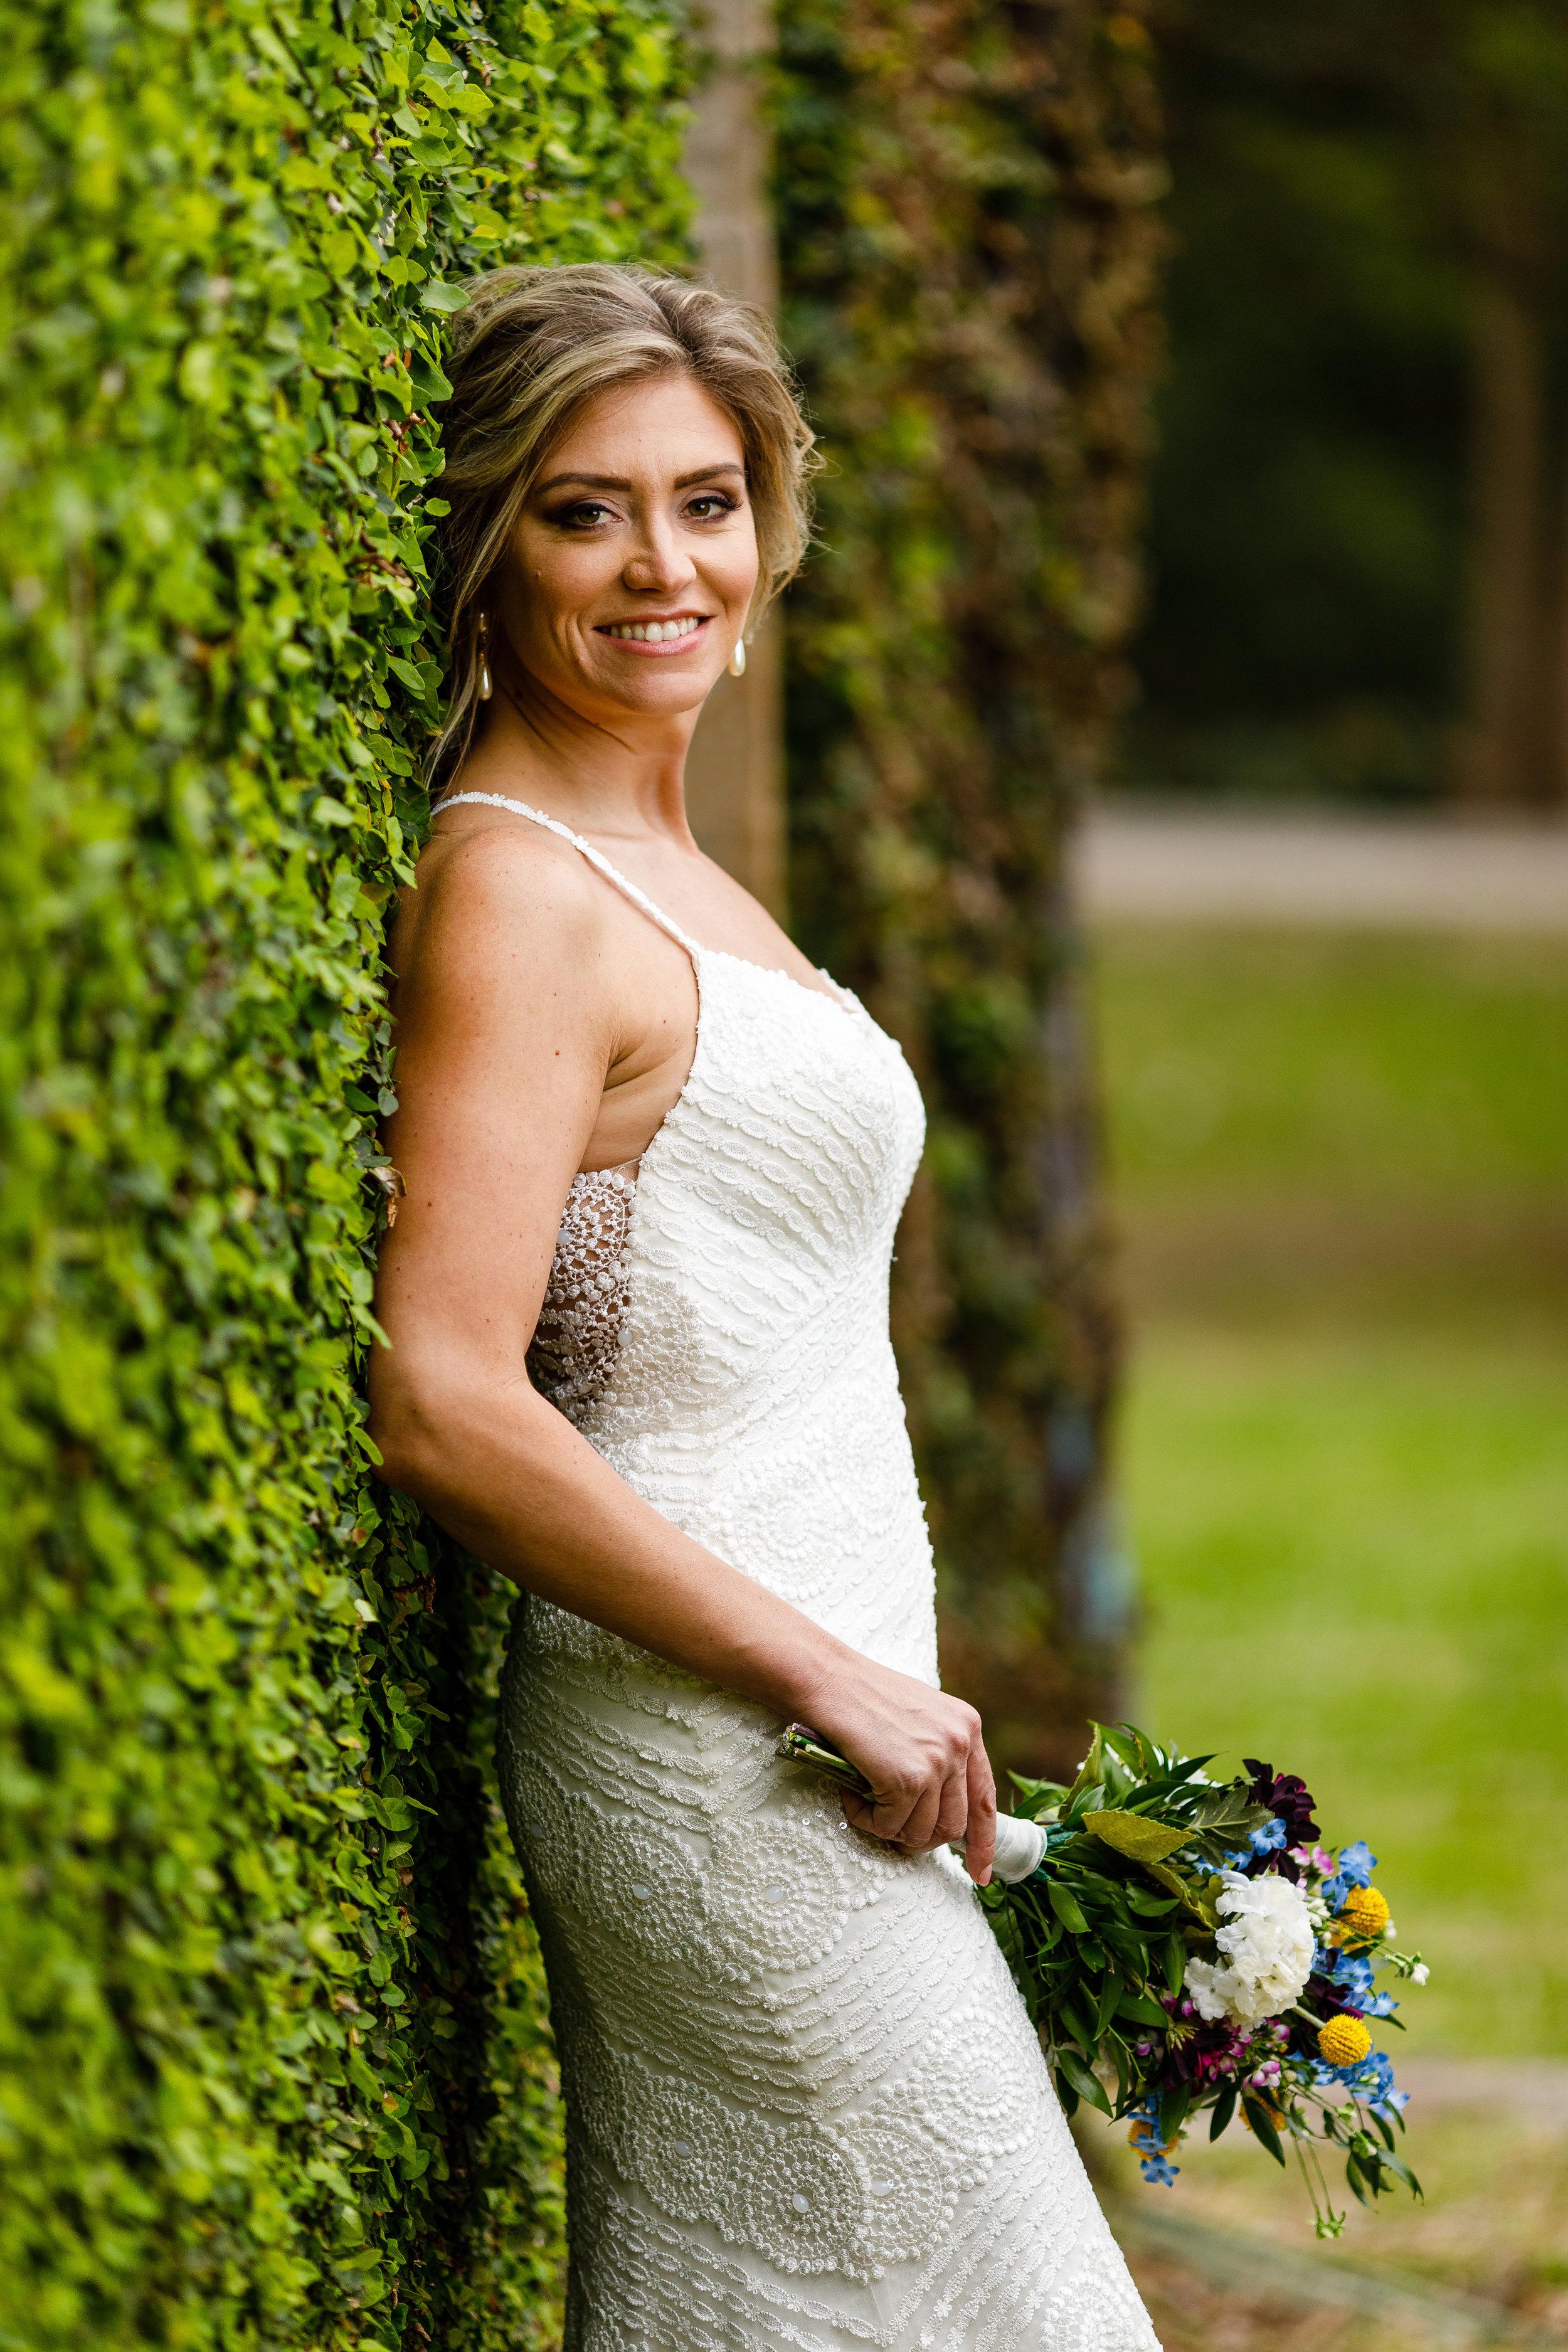 Youngsville-lafayette-portrait-family-wedding-photographer--2.jpg